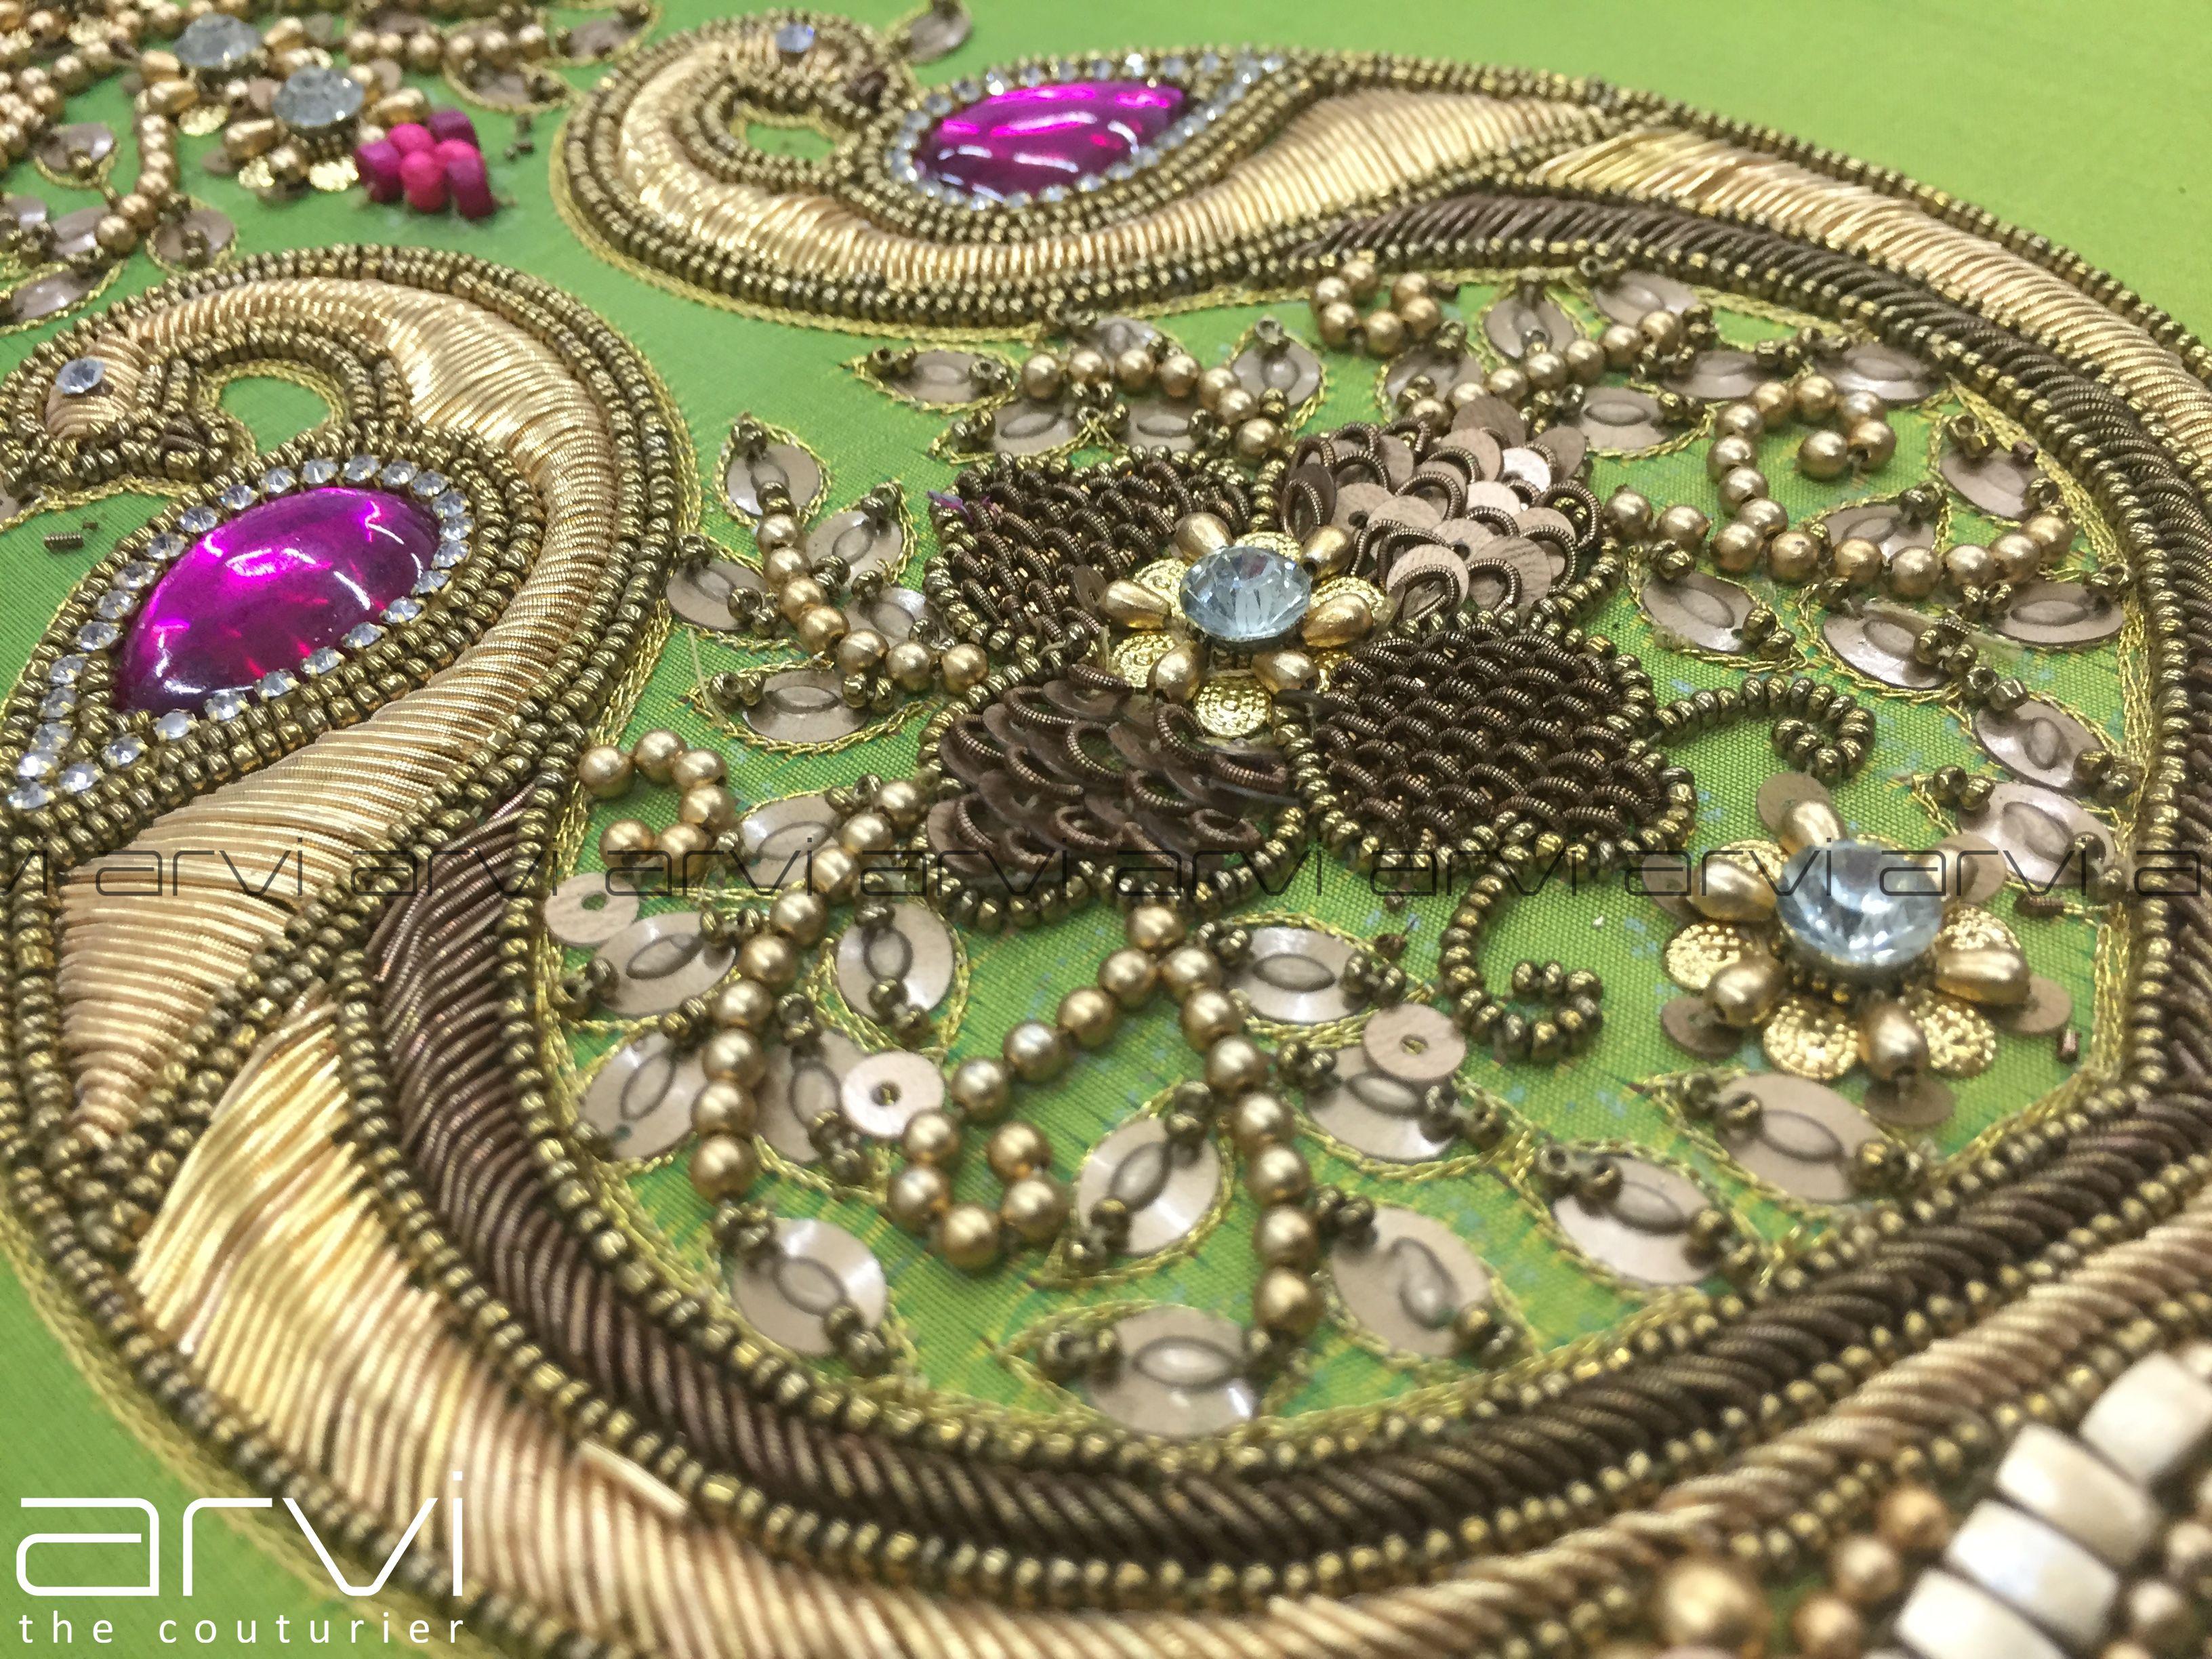 Arvi The Couturier Artistry Aariwork Aari Embroidery Jewellery Jewellerywork Art Des Ladies Boutique Maggam Work Blouse Designs Blouse Designs Indian